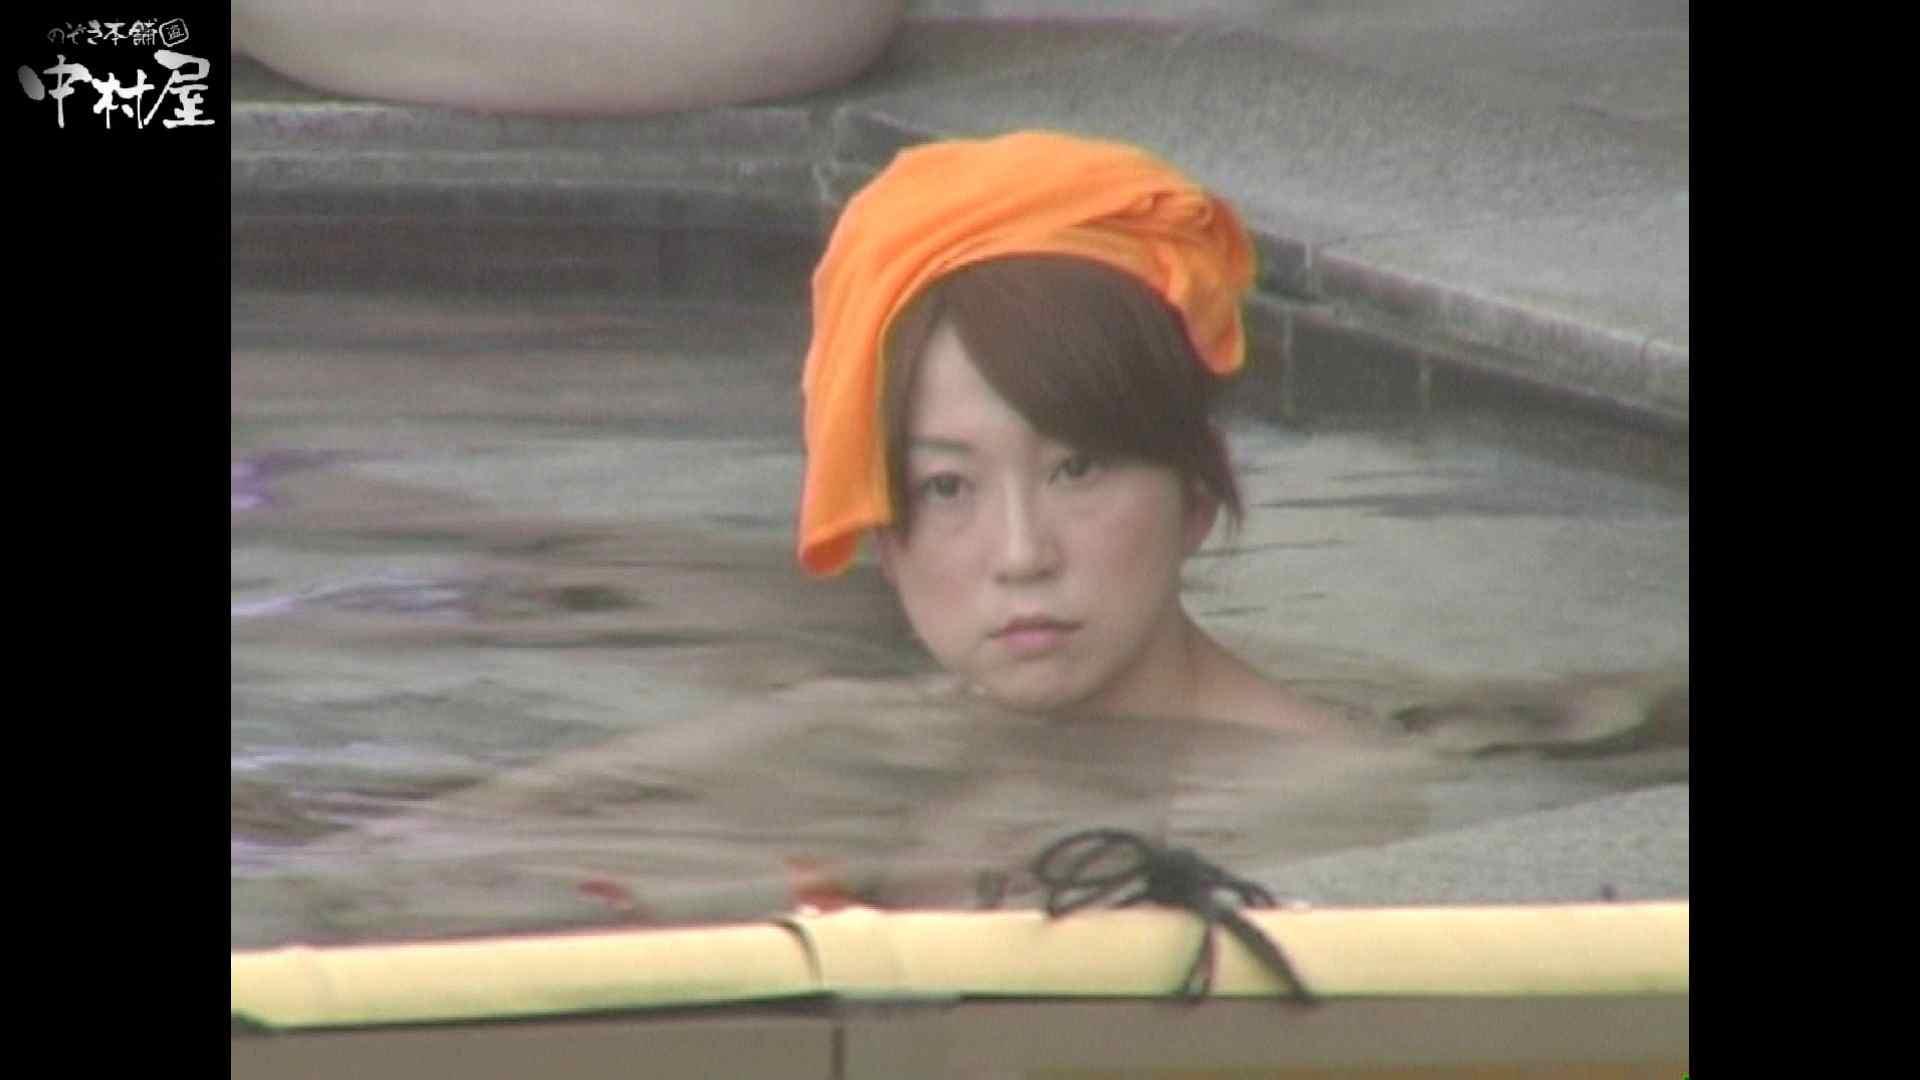 Aquaな露天風呂Vol.941 盗撮師作品  76pic 24